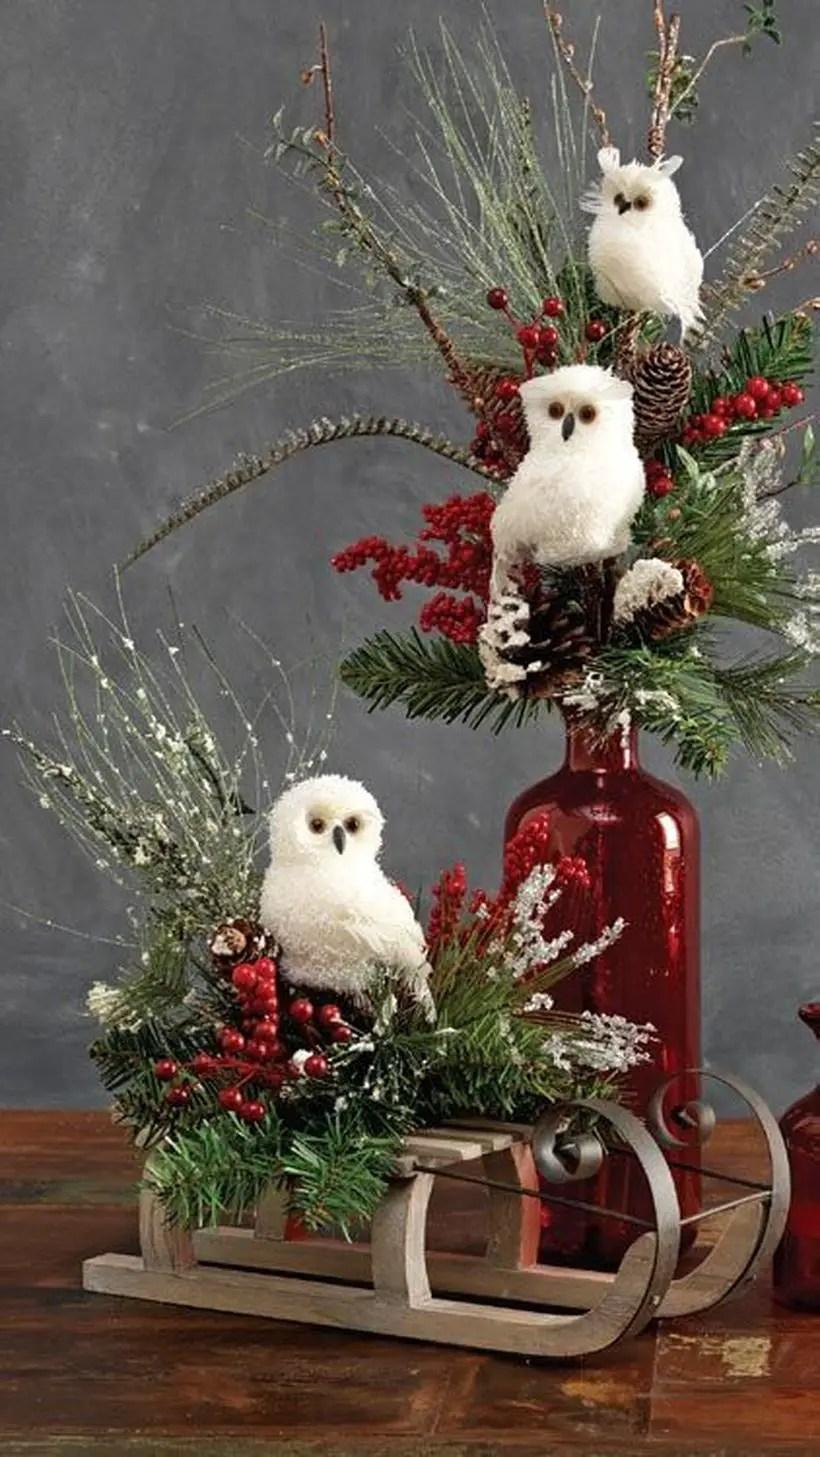 Fun-and-creative-sleigh-decor-ideas-for-christmas-19